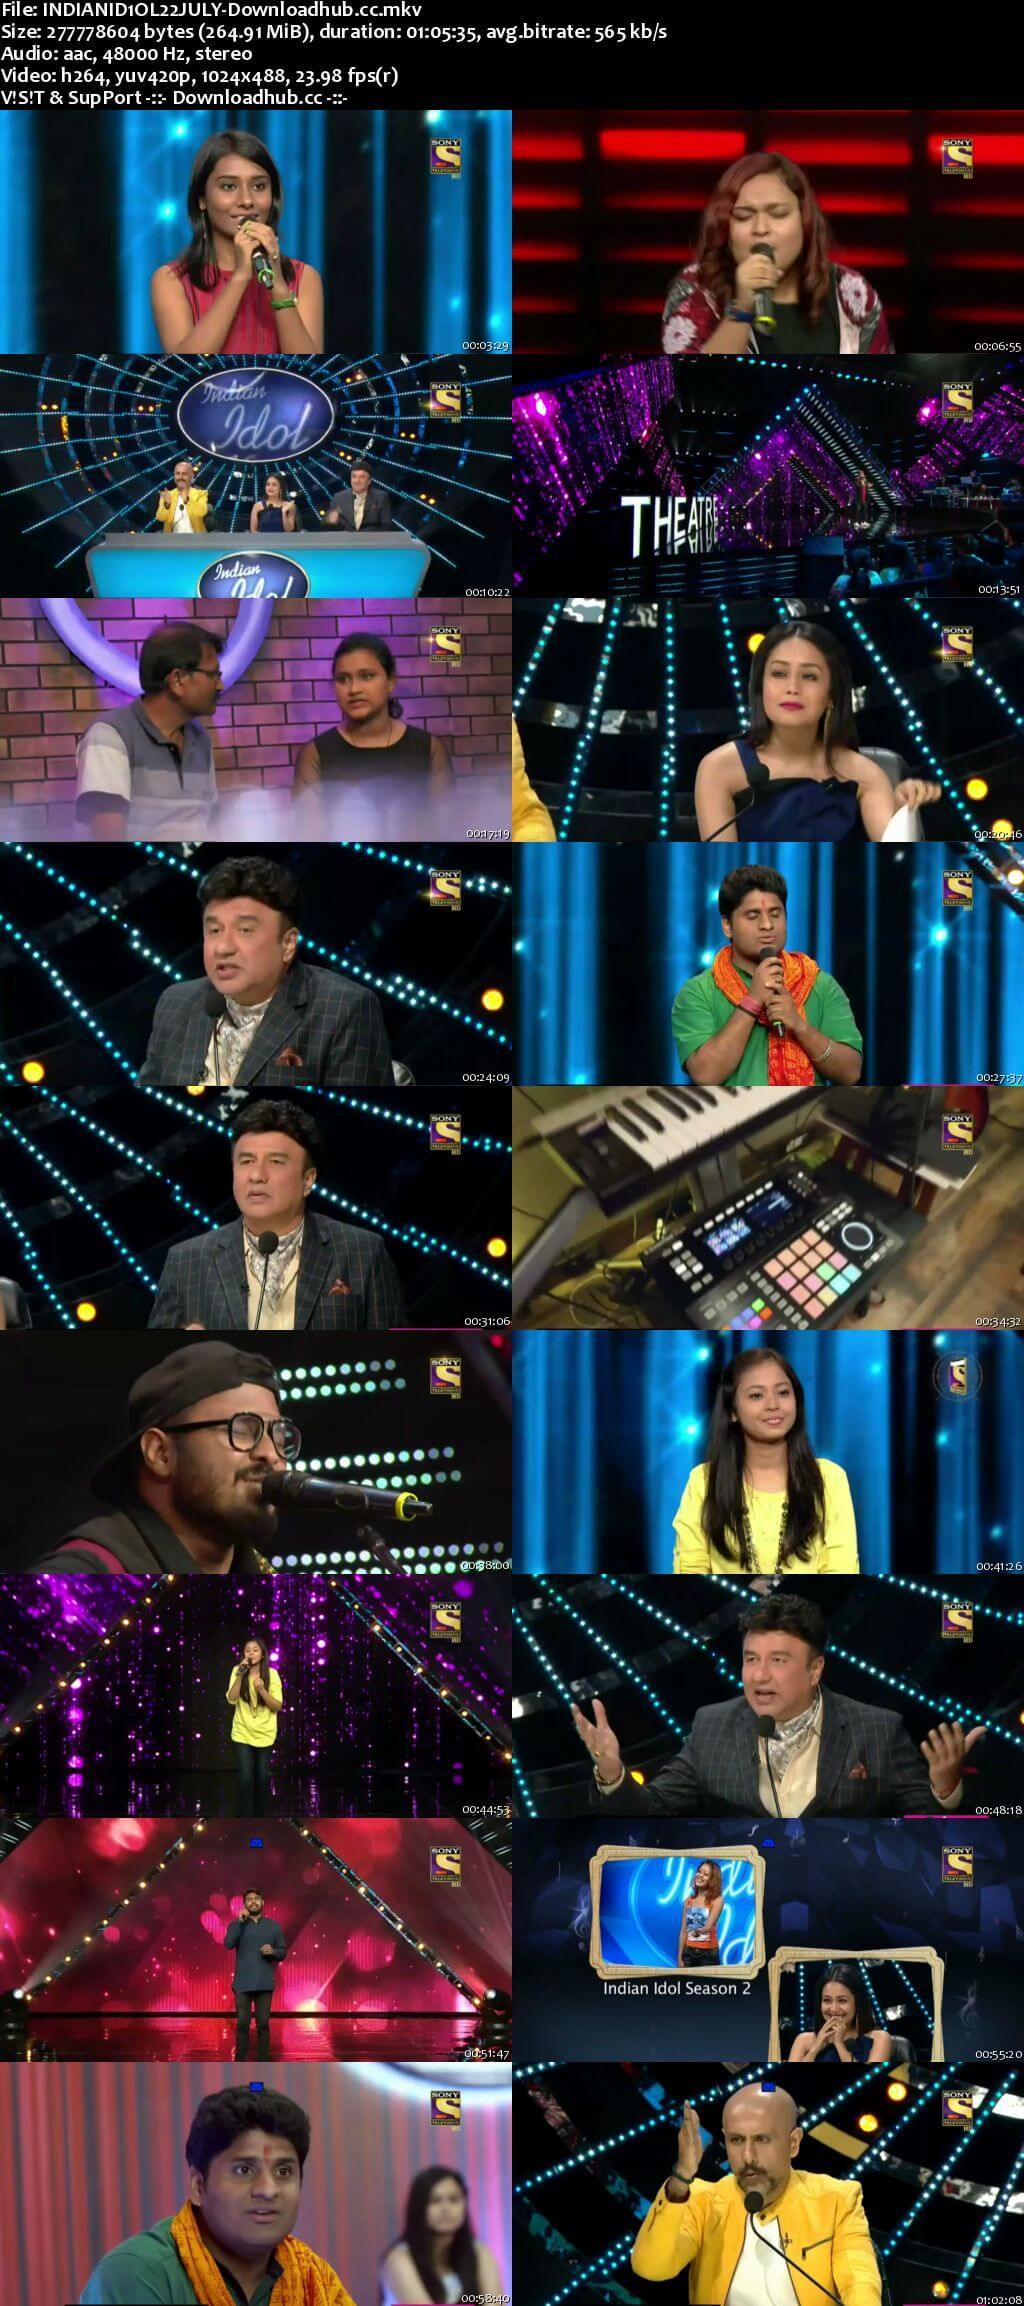 Indian Idol 22 July 2018 Episode 06 HDTV 480p